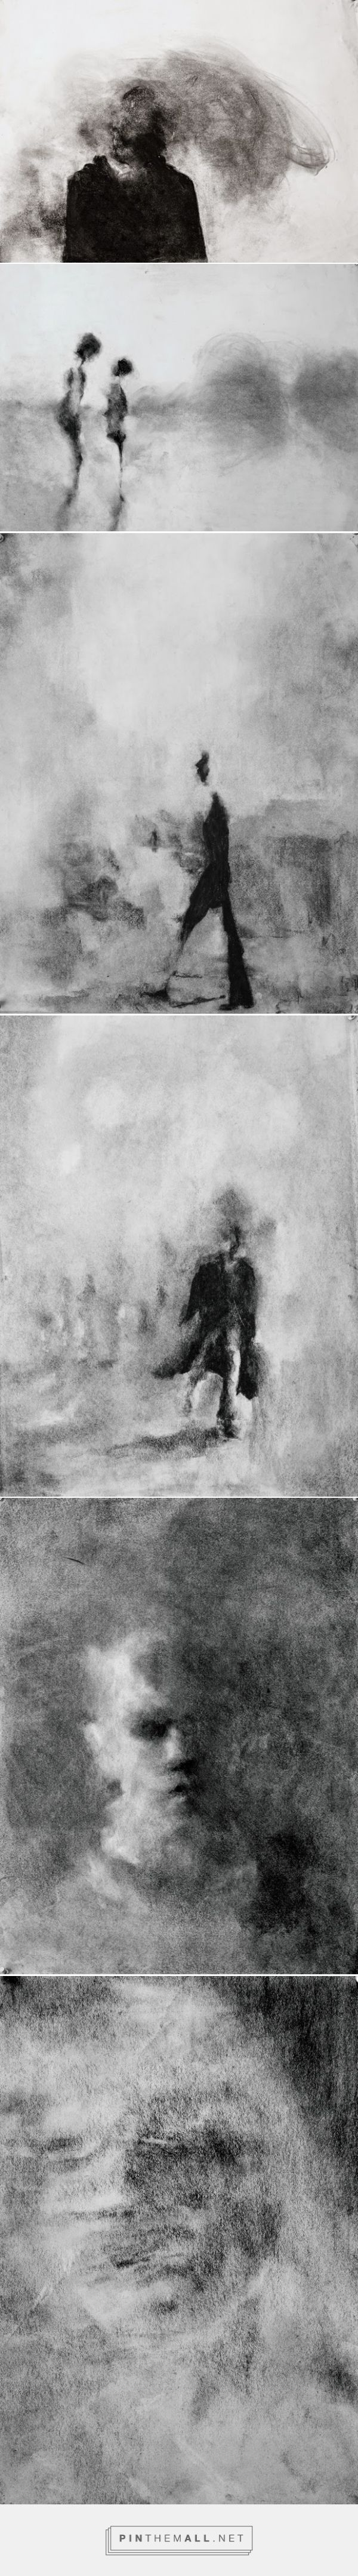 A glimpse / Alessandra Hogan